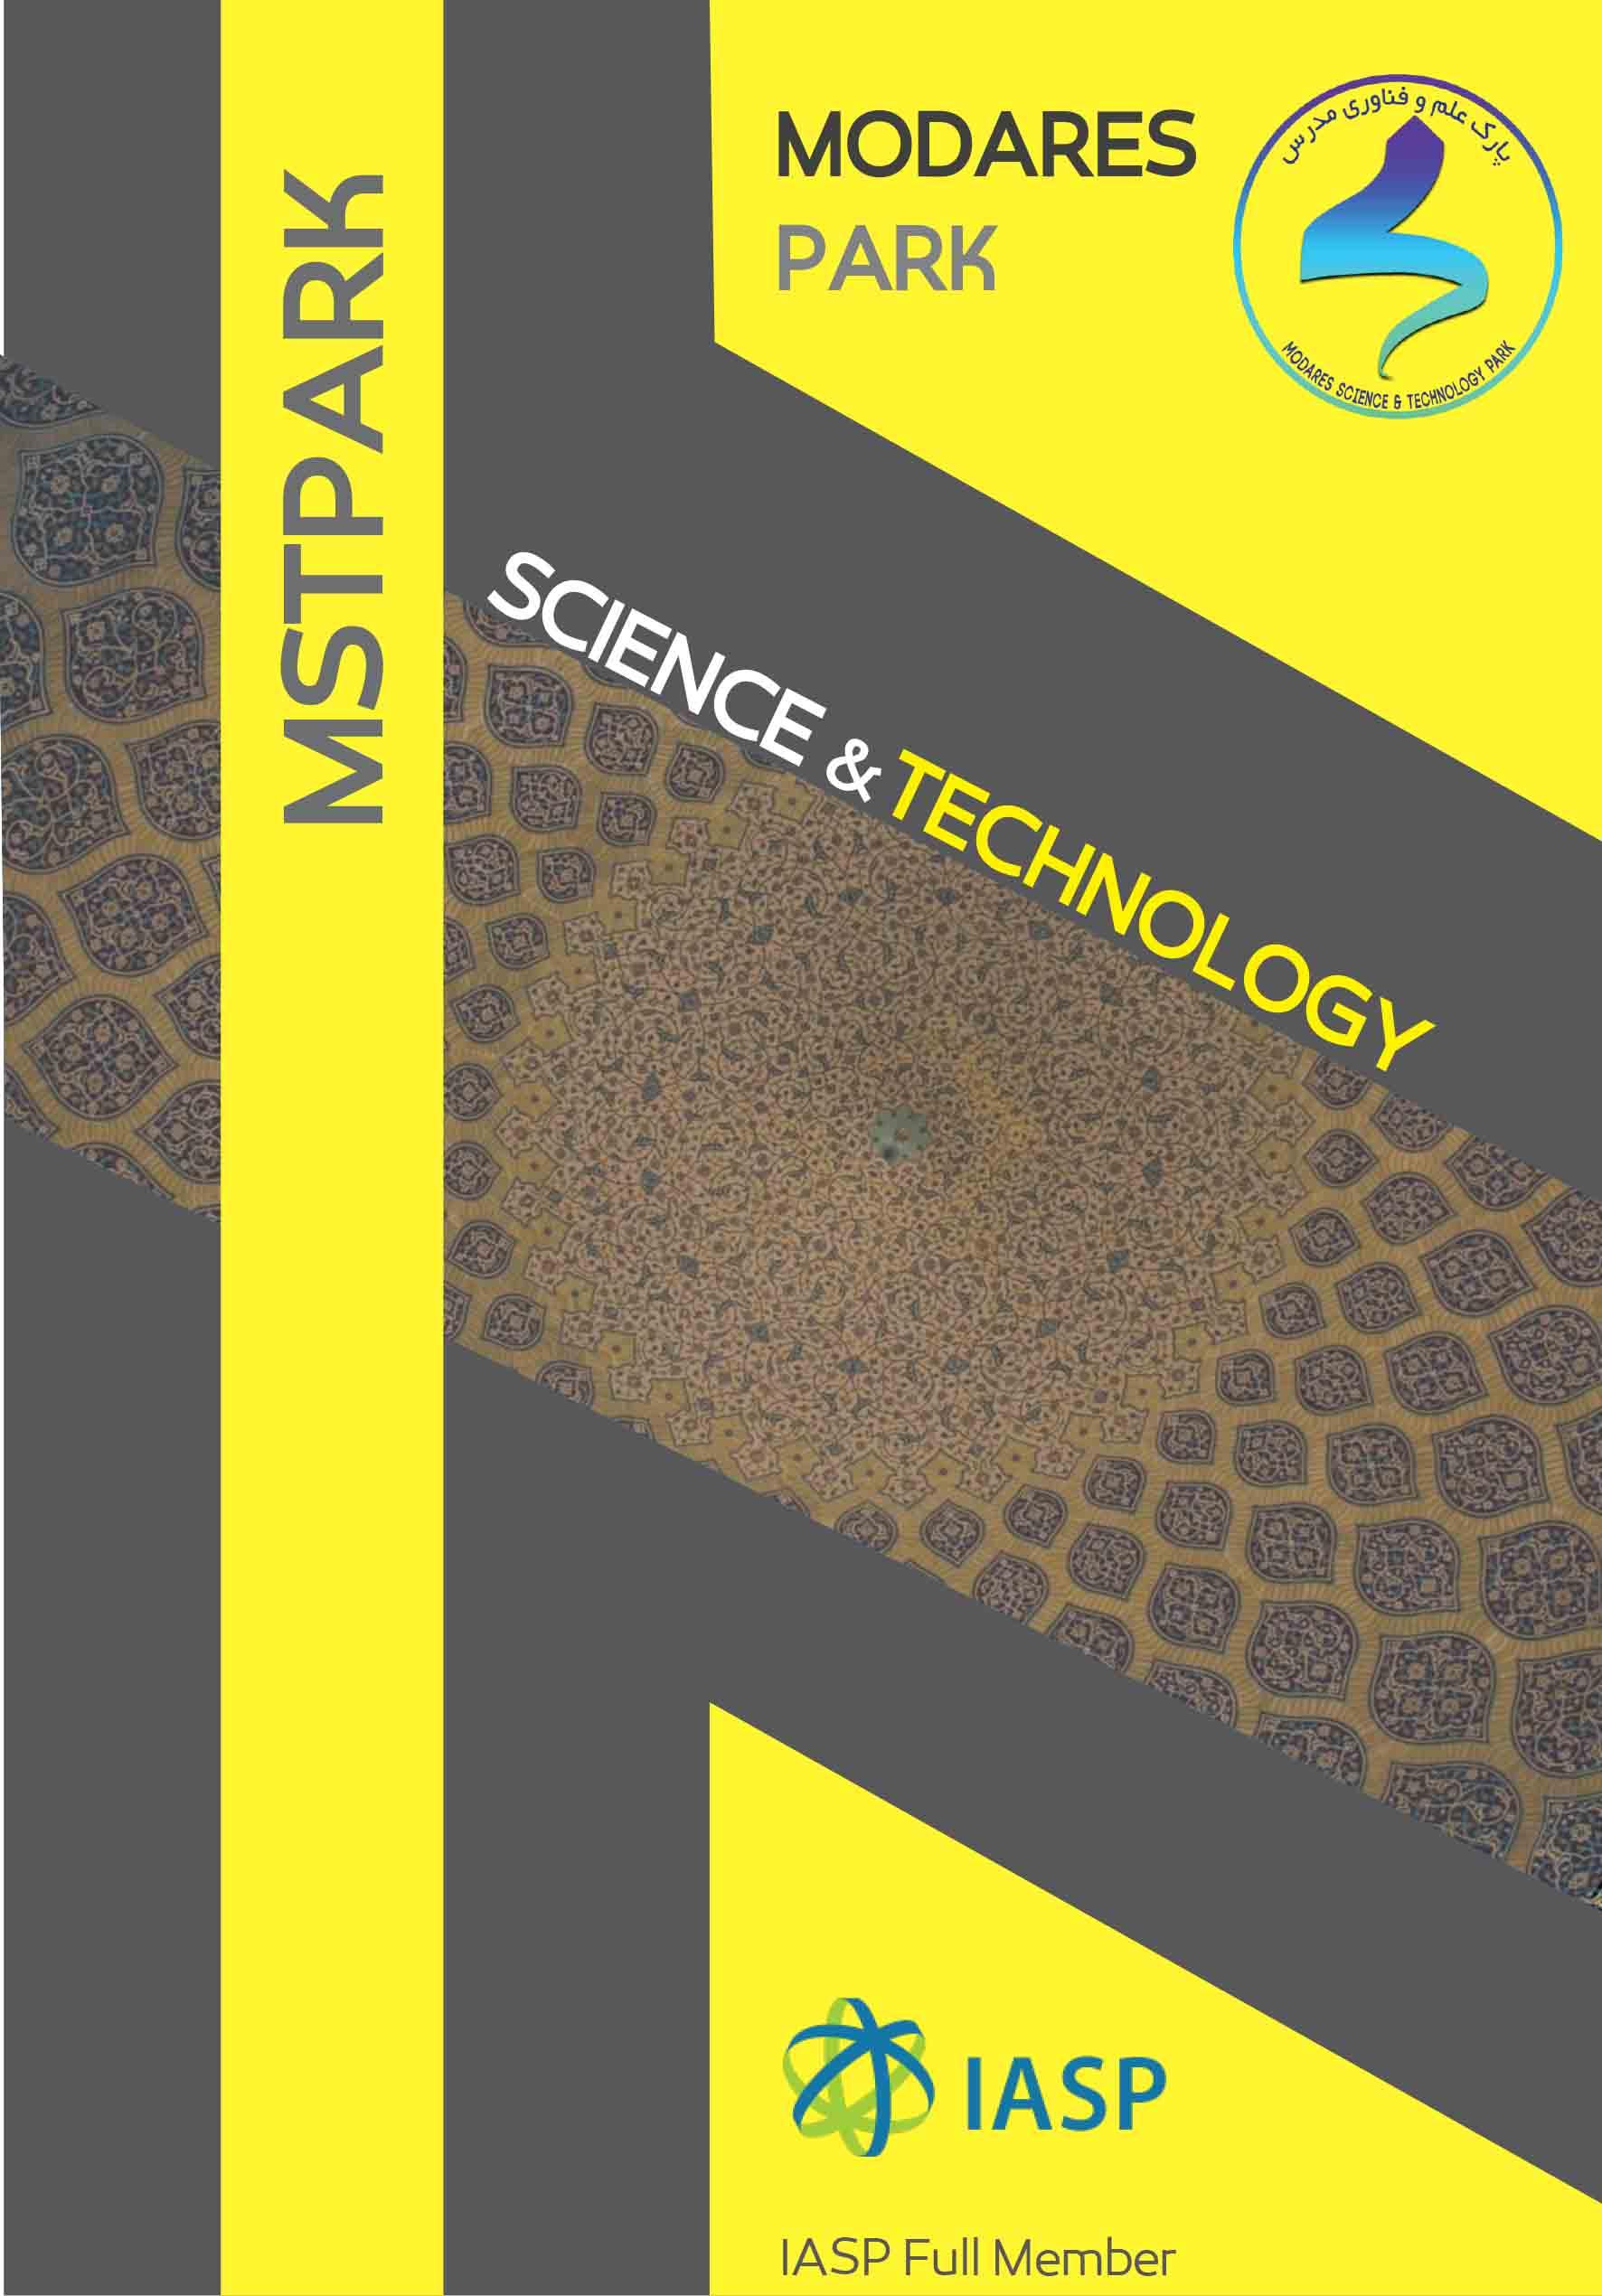 کاتالوگ انگلیسی پارک علم و فناوری دانشگاه تربیت مدرس